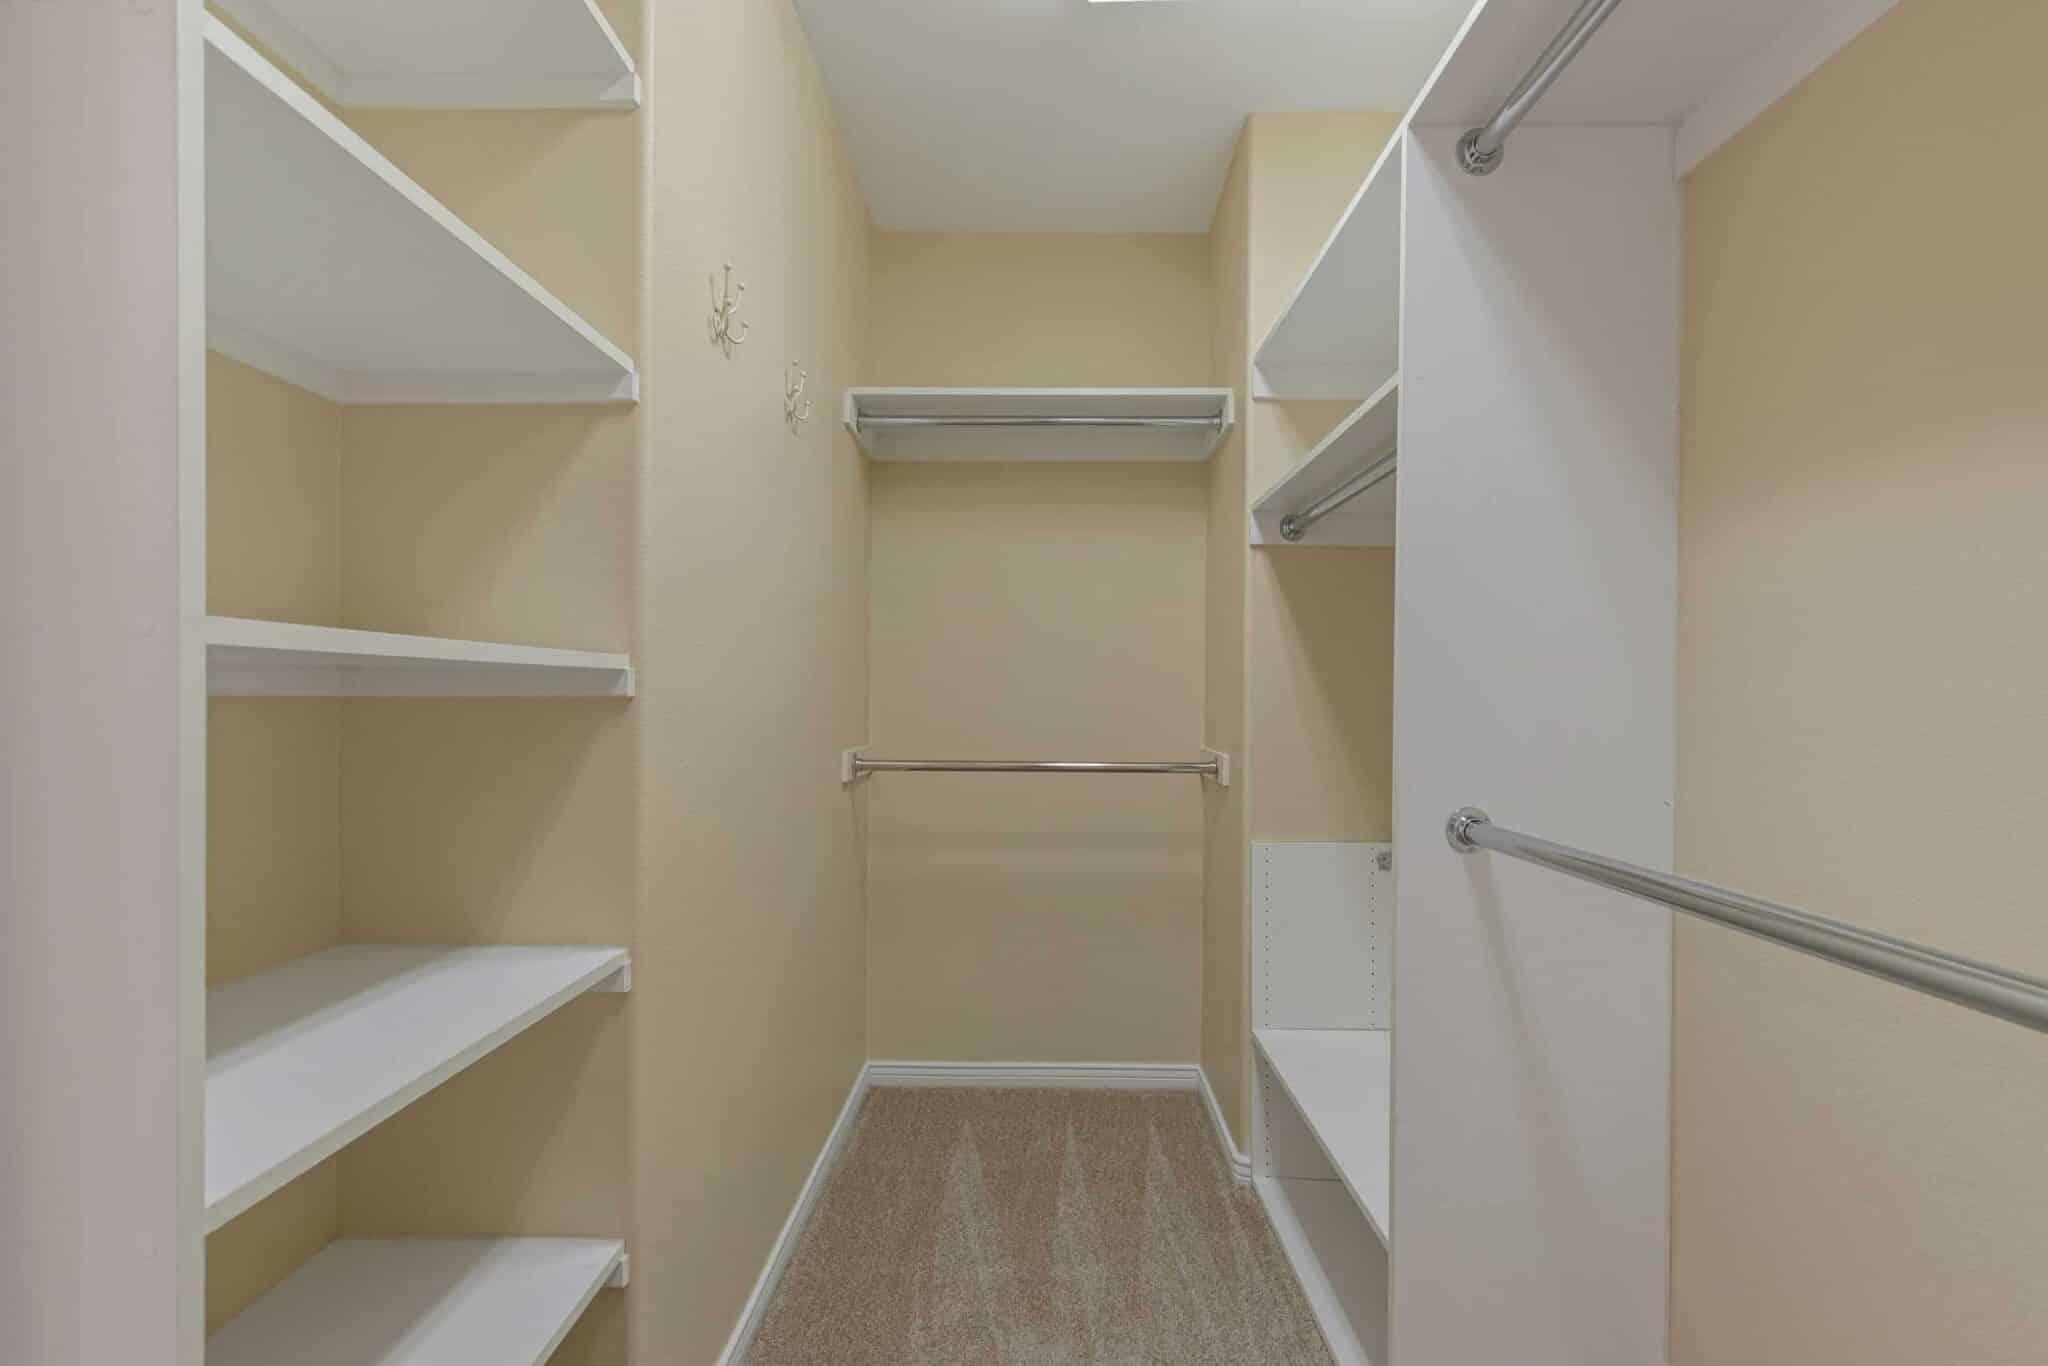 las-vegas-luxry-real-estate-realtor-rob-jensen-company-2620-grassy-spring-place-rrcc42